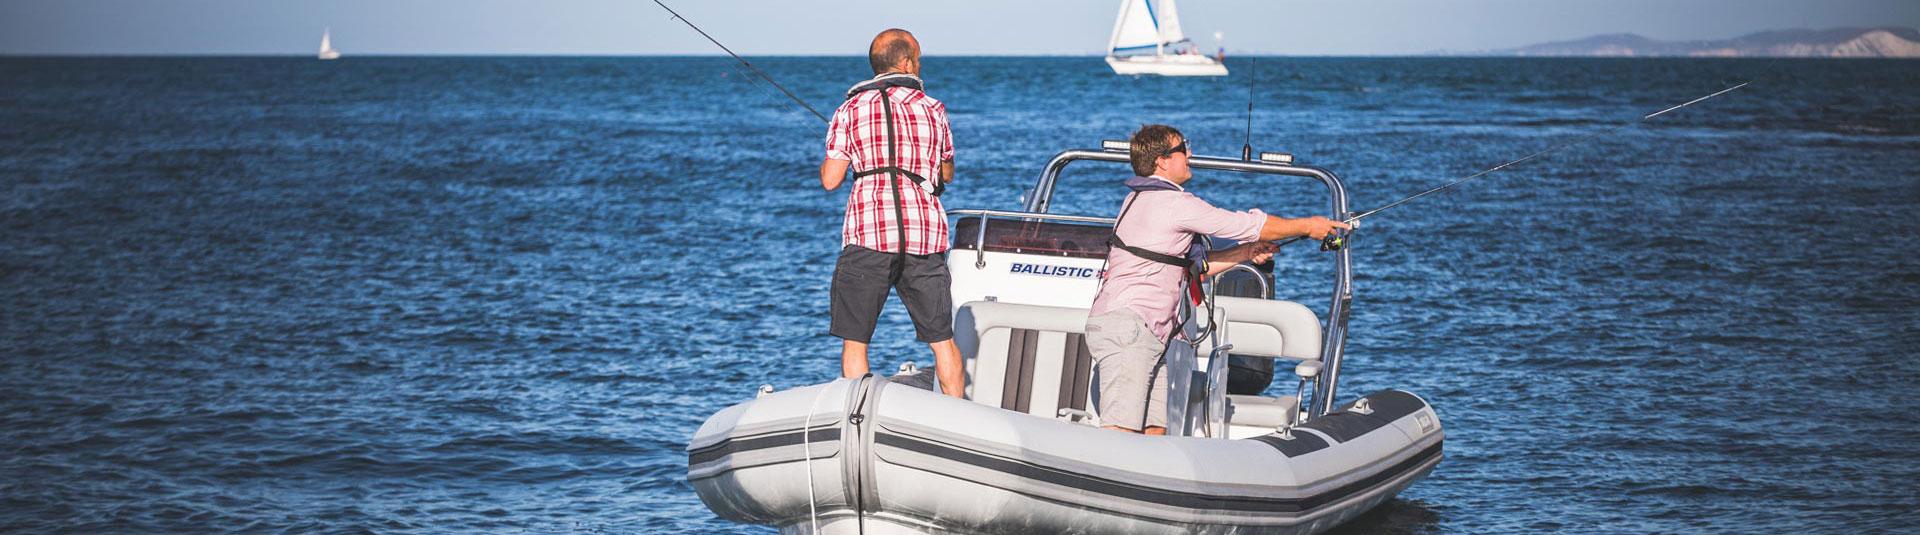 Boatclubtrafalgar